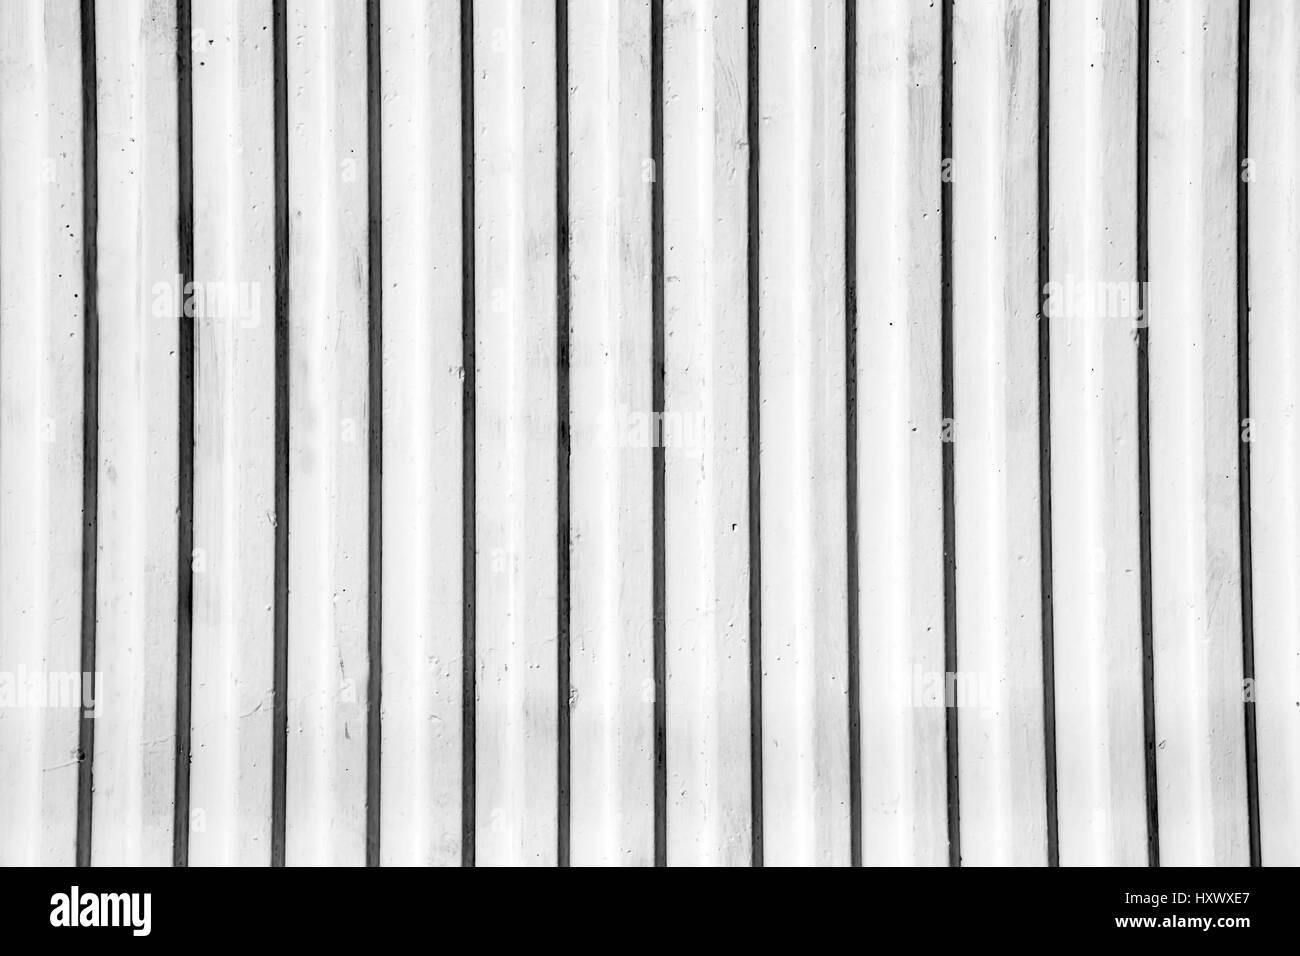 Wand des vertikalen konkrete Streifen Stockbild